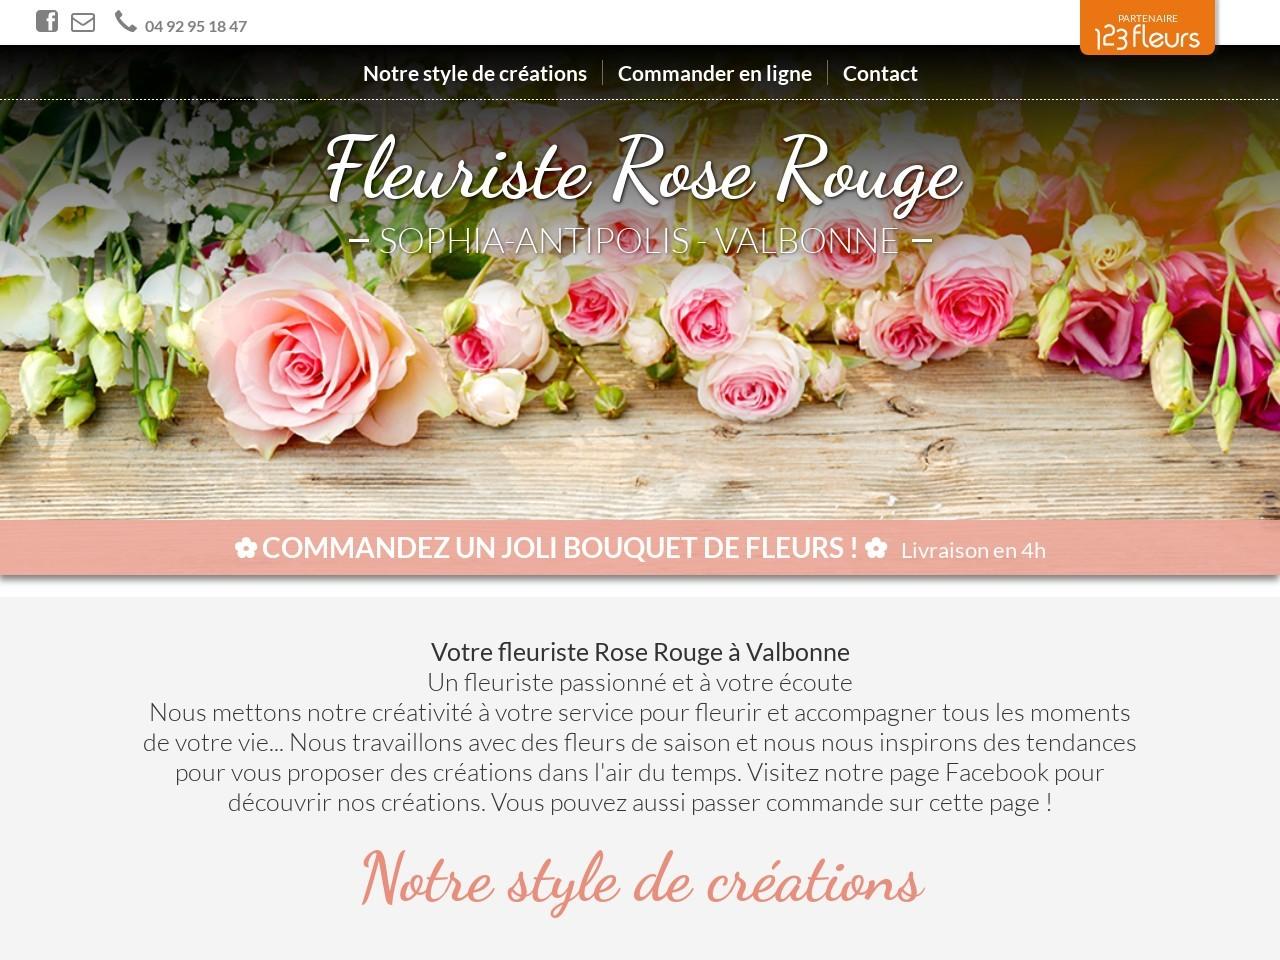 Site fleuriste Rose Rouge - 123fleurs